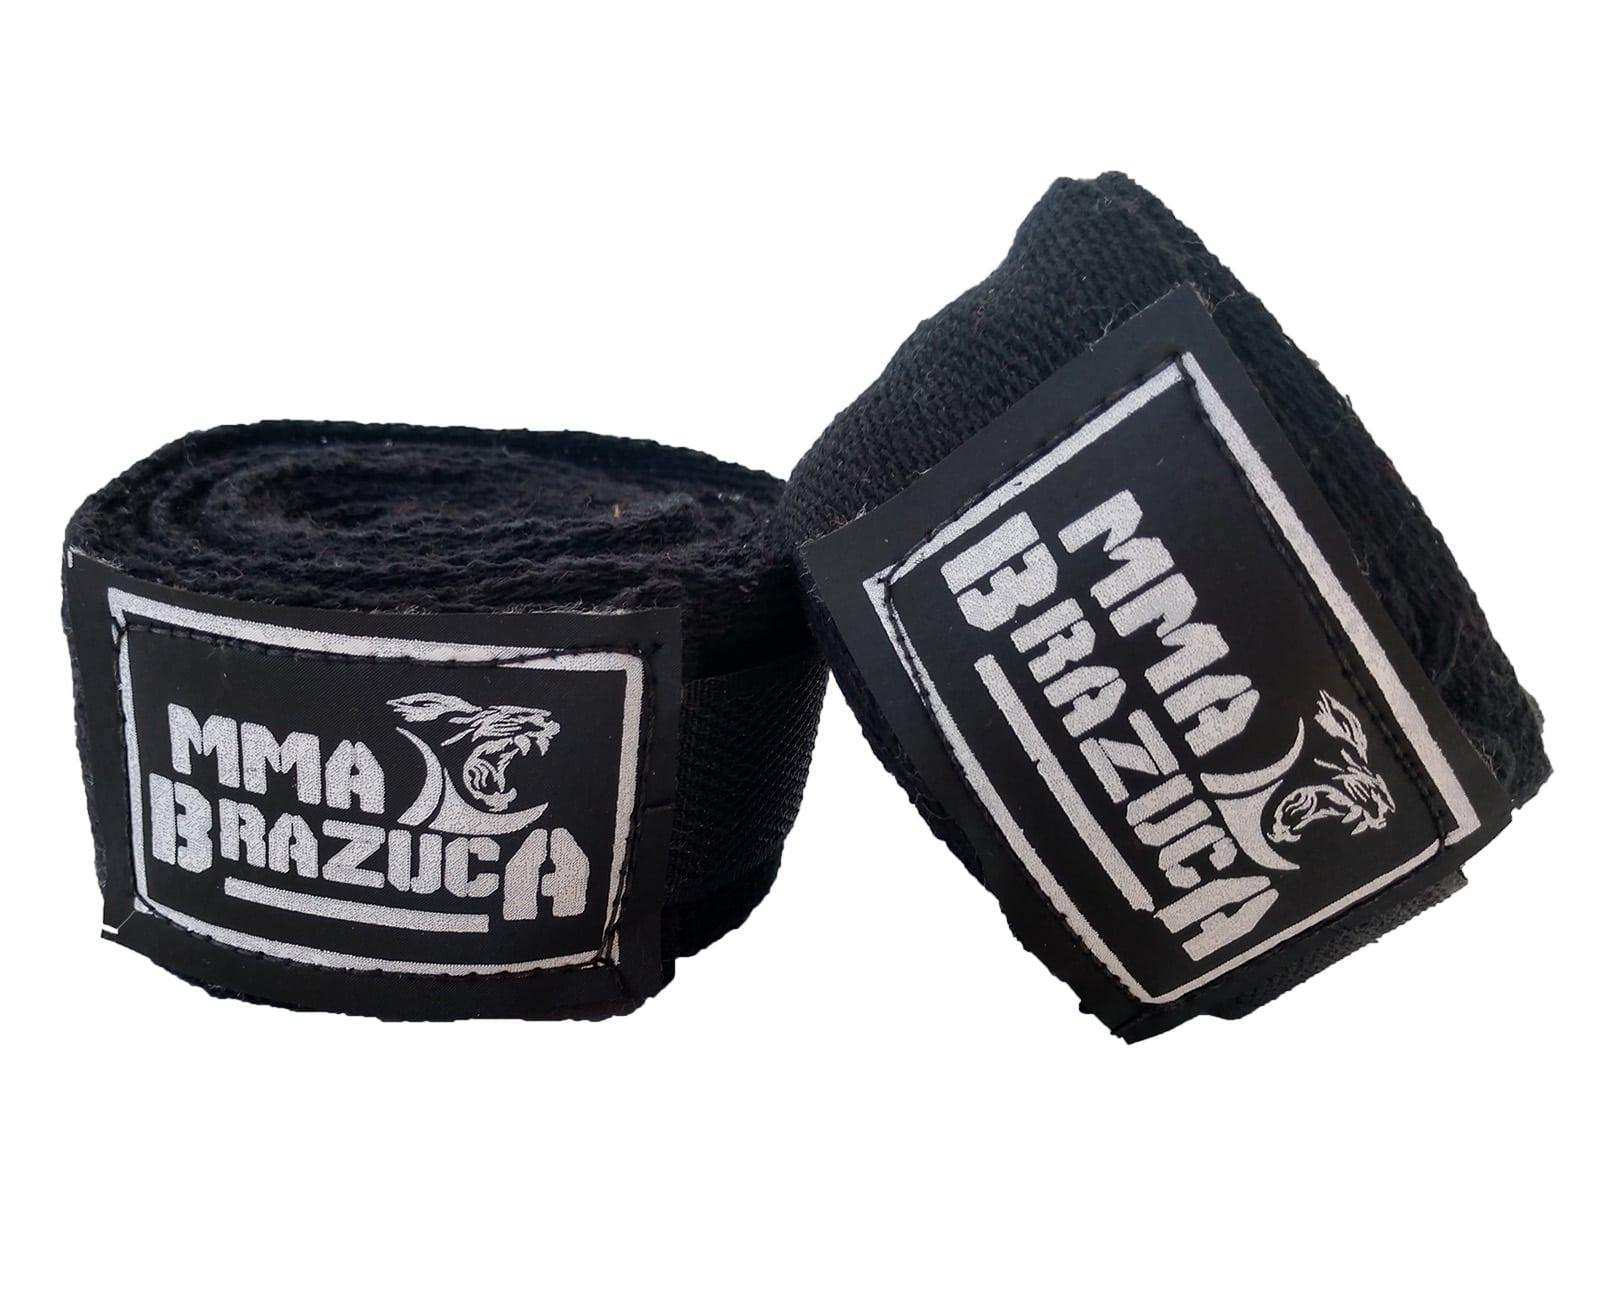 Kit de Boxe / Muay Thai 12oz Feminino - Preto com Rosa - MMA Brazuka  - PRALUTA SHOP